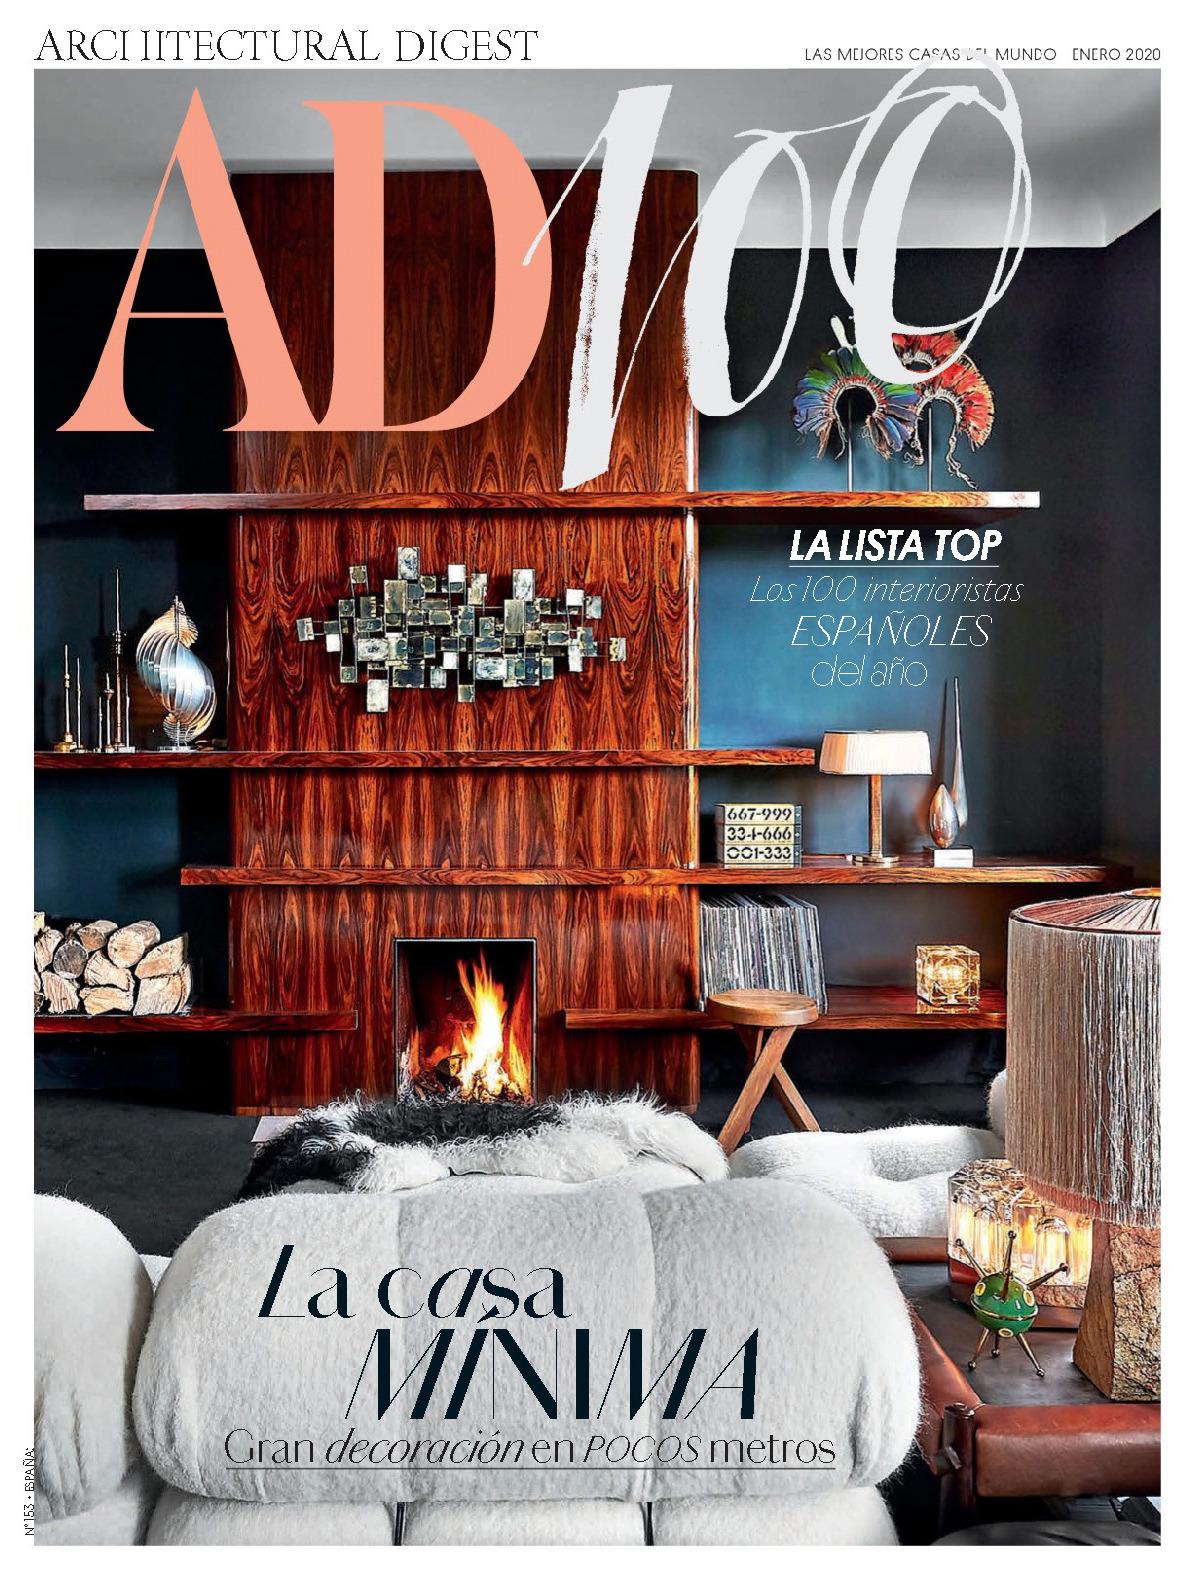 《AD》西班牙版室内室外设计杂志2020年01月号